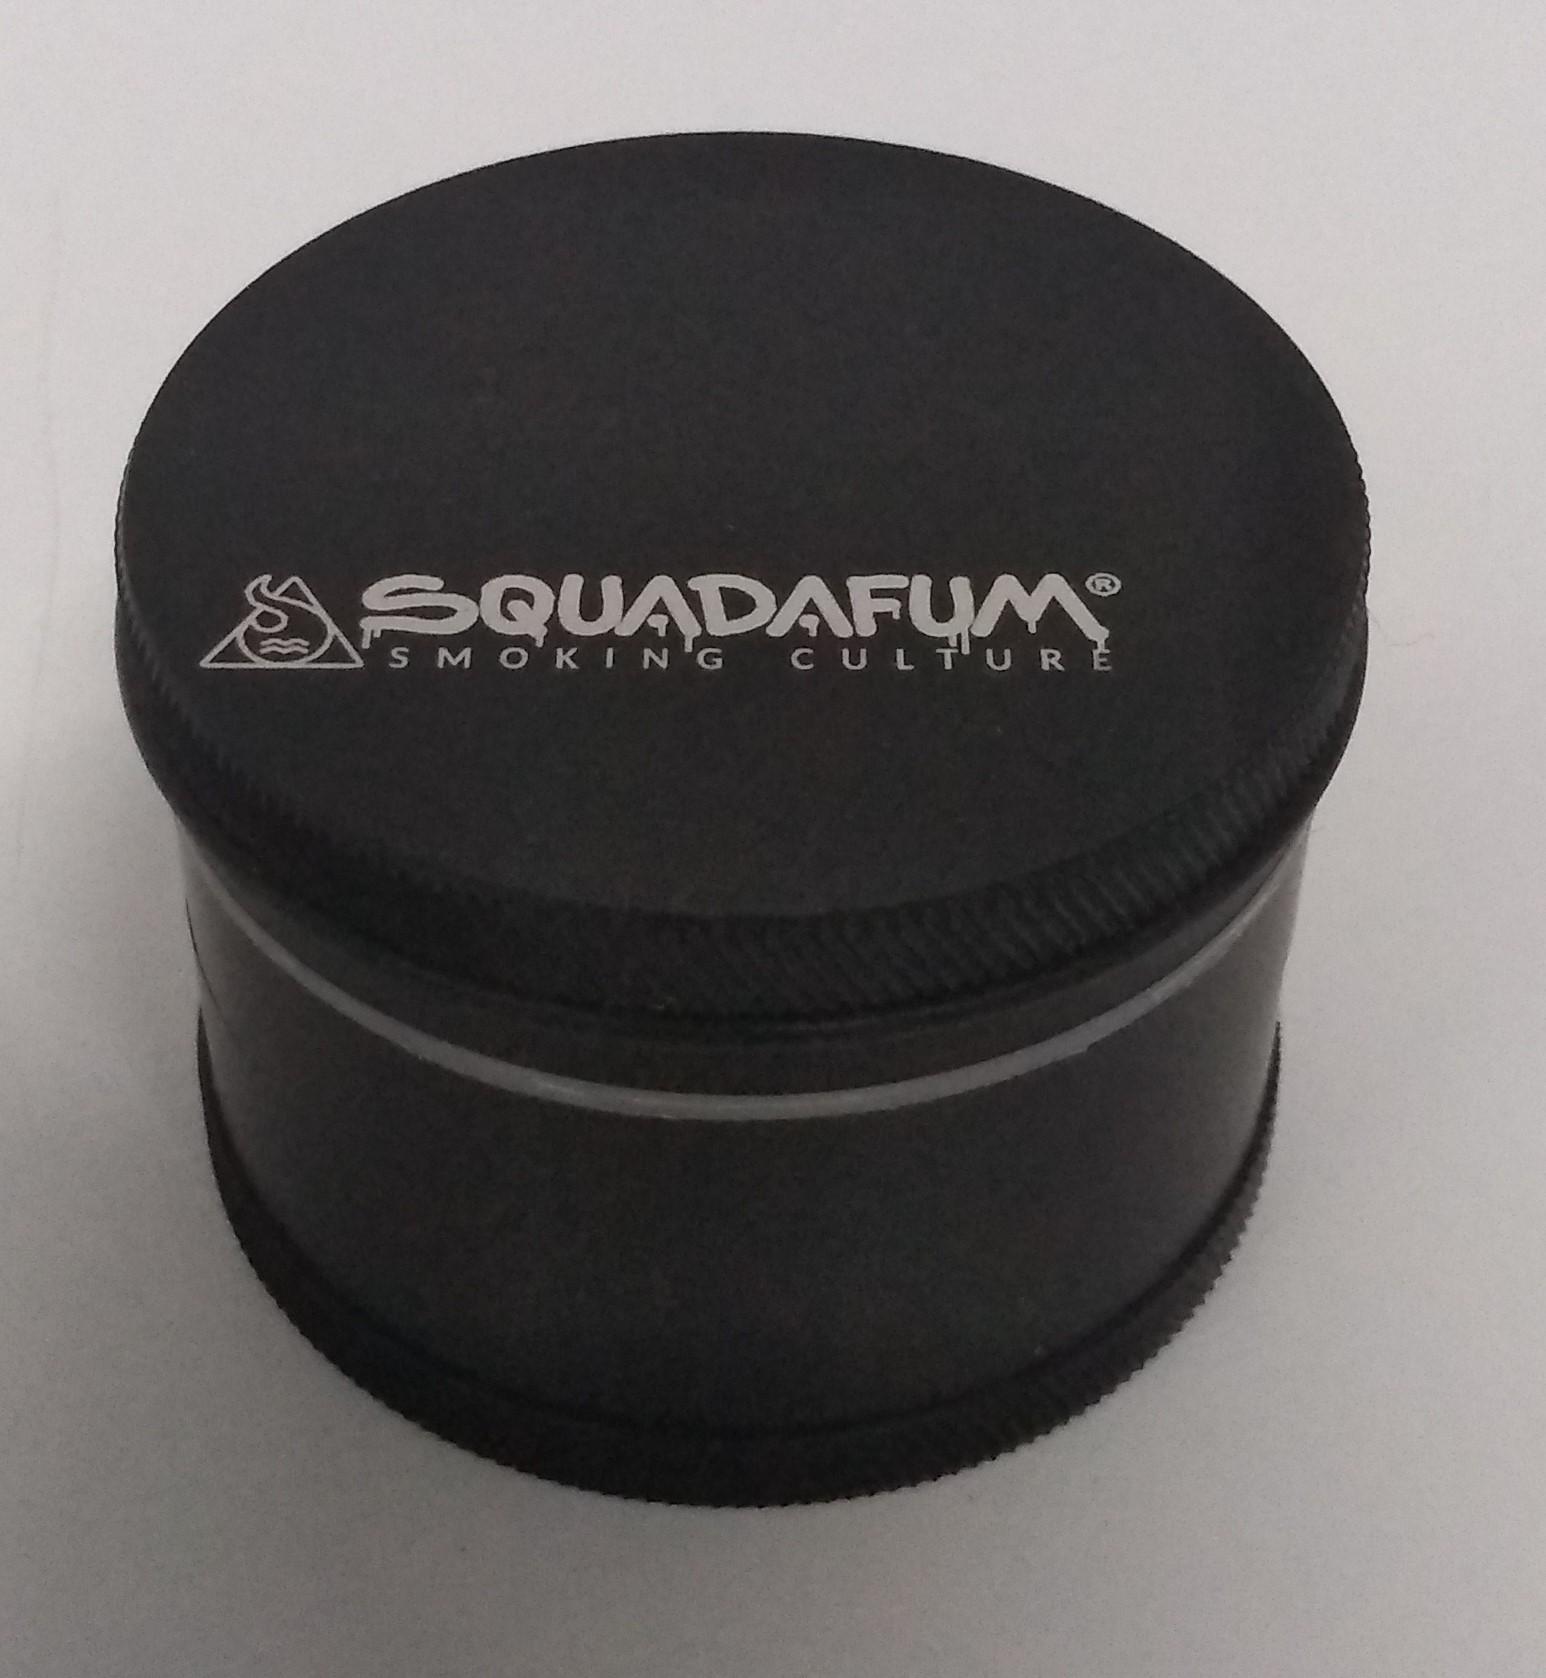 Triturador Squadafum 4011 Preto